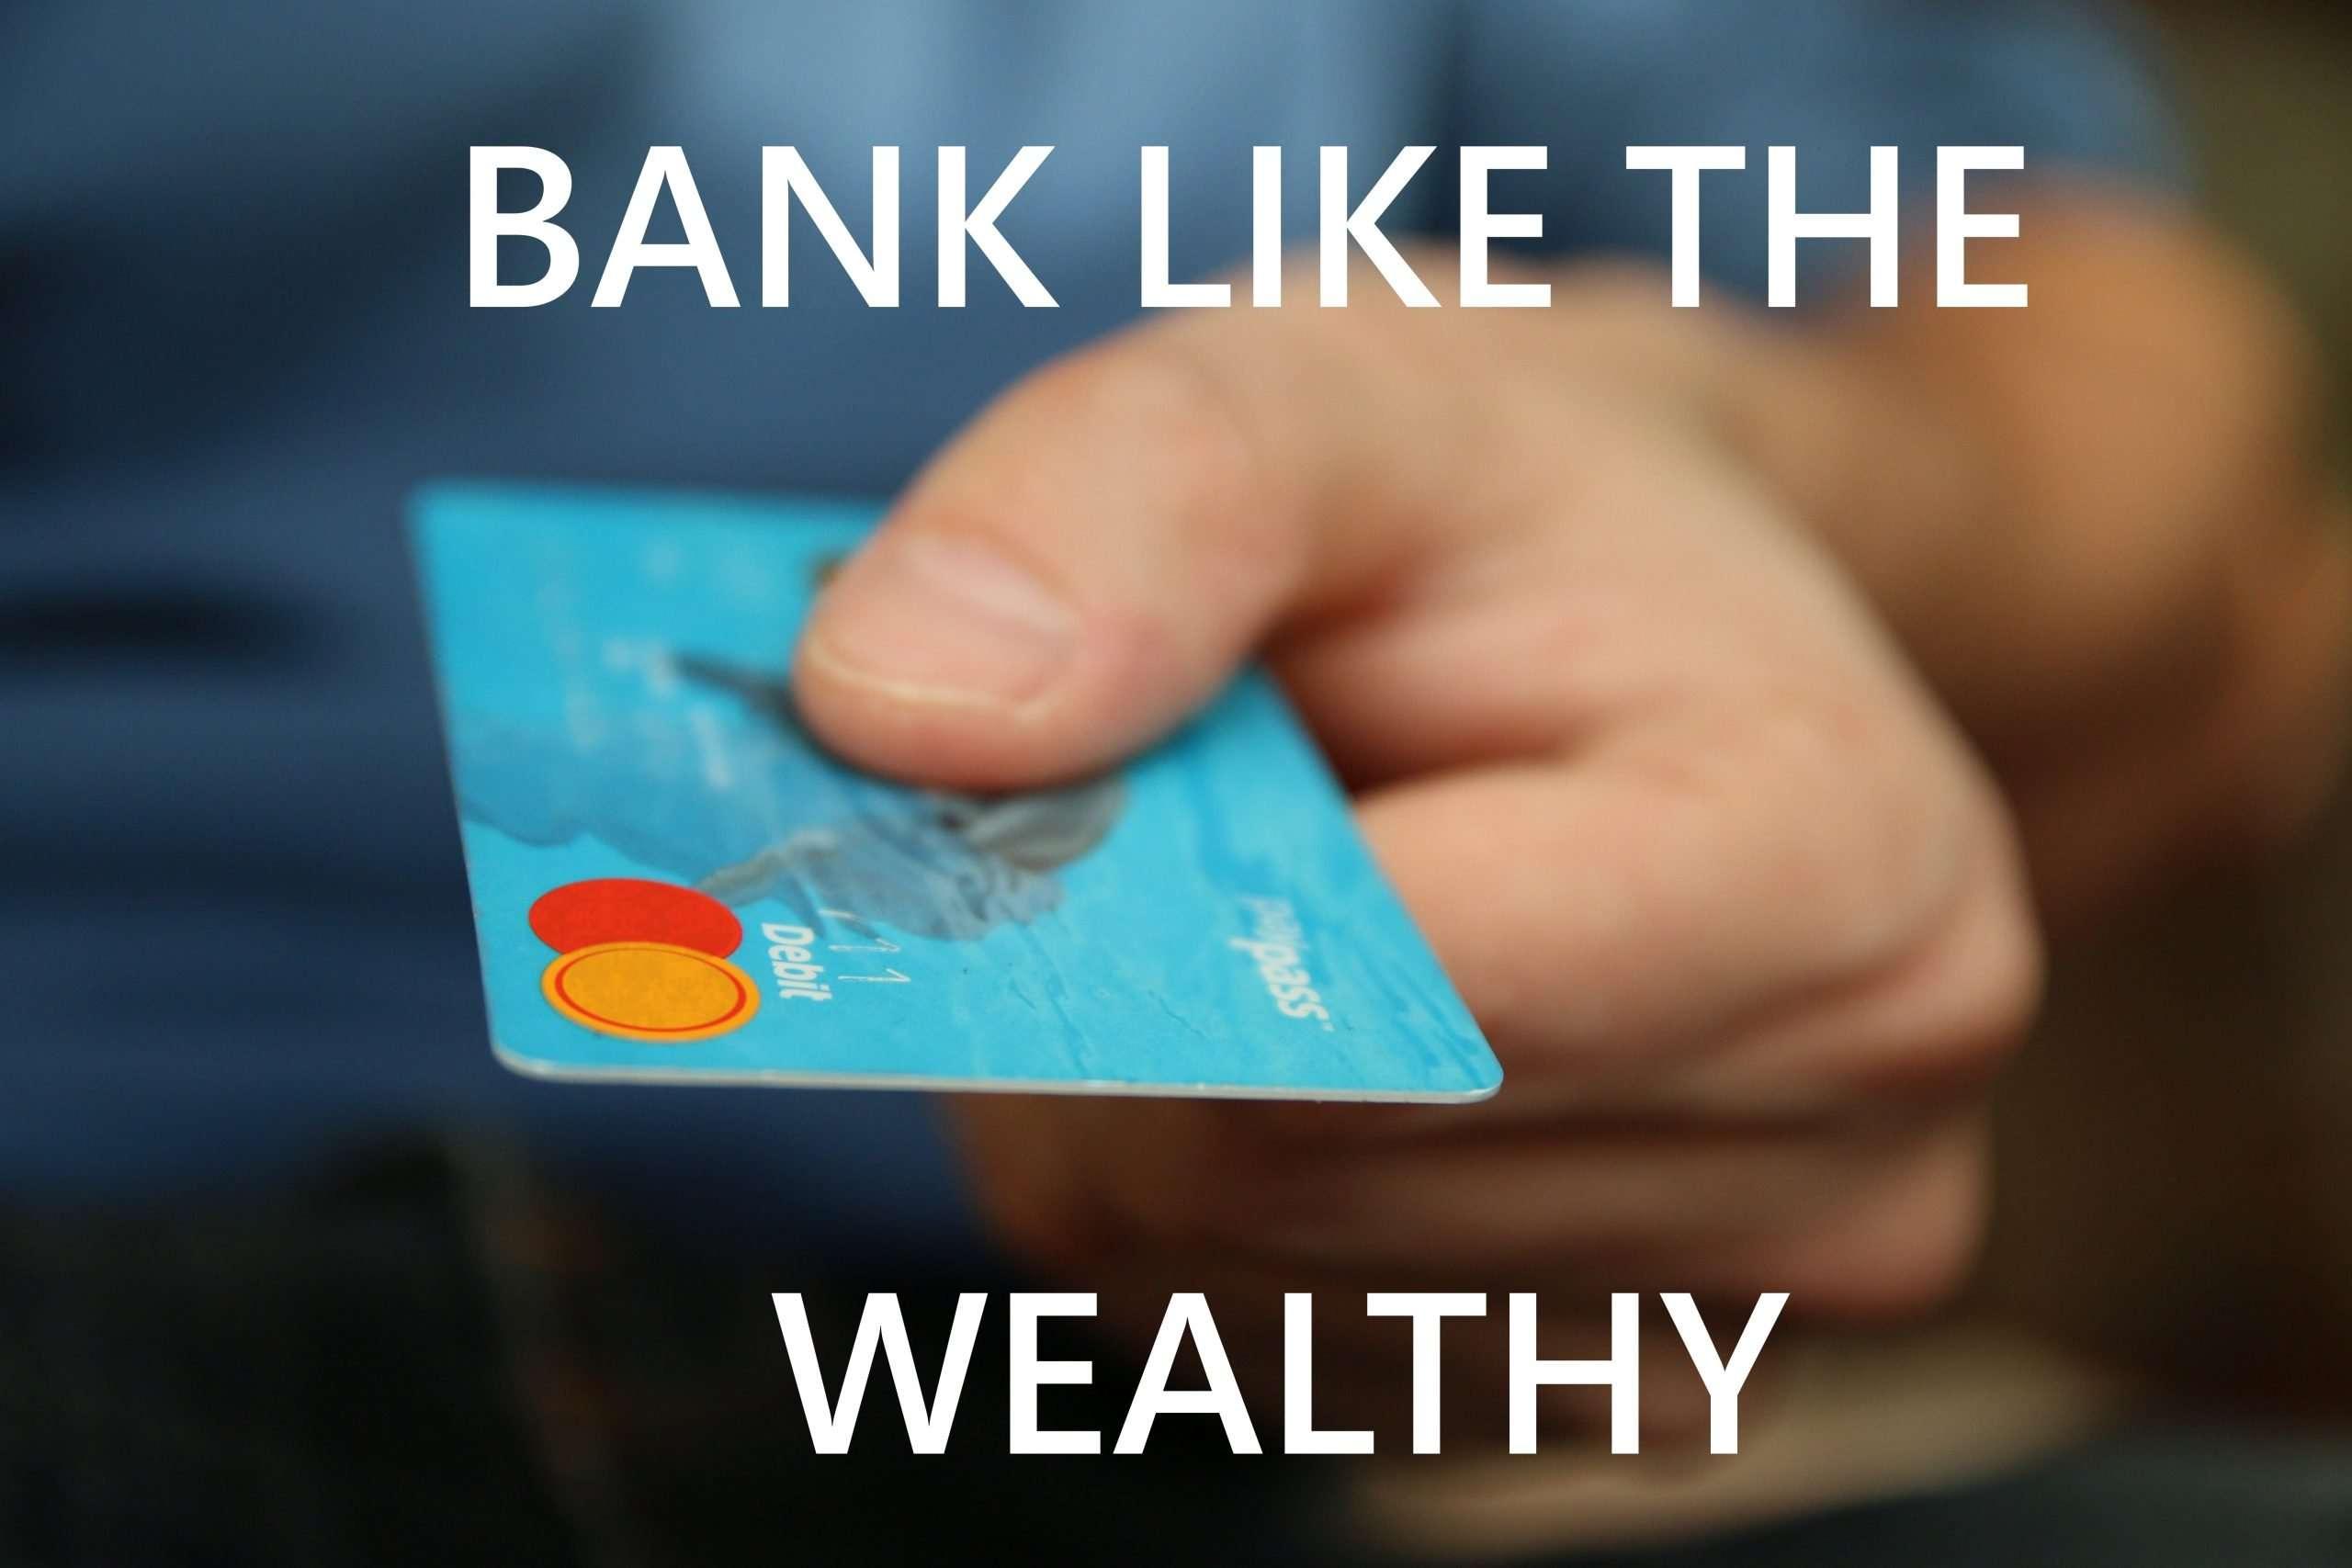 Bank Like the Wealthy